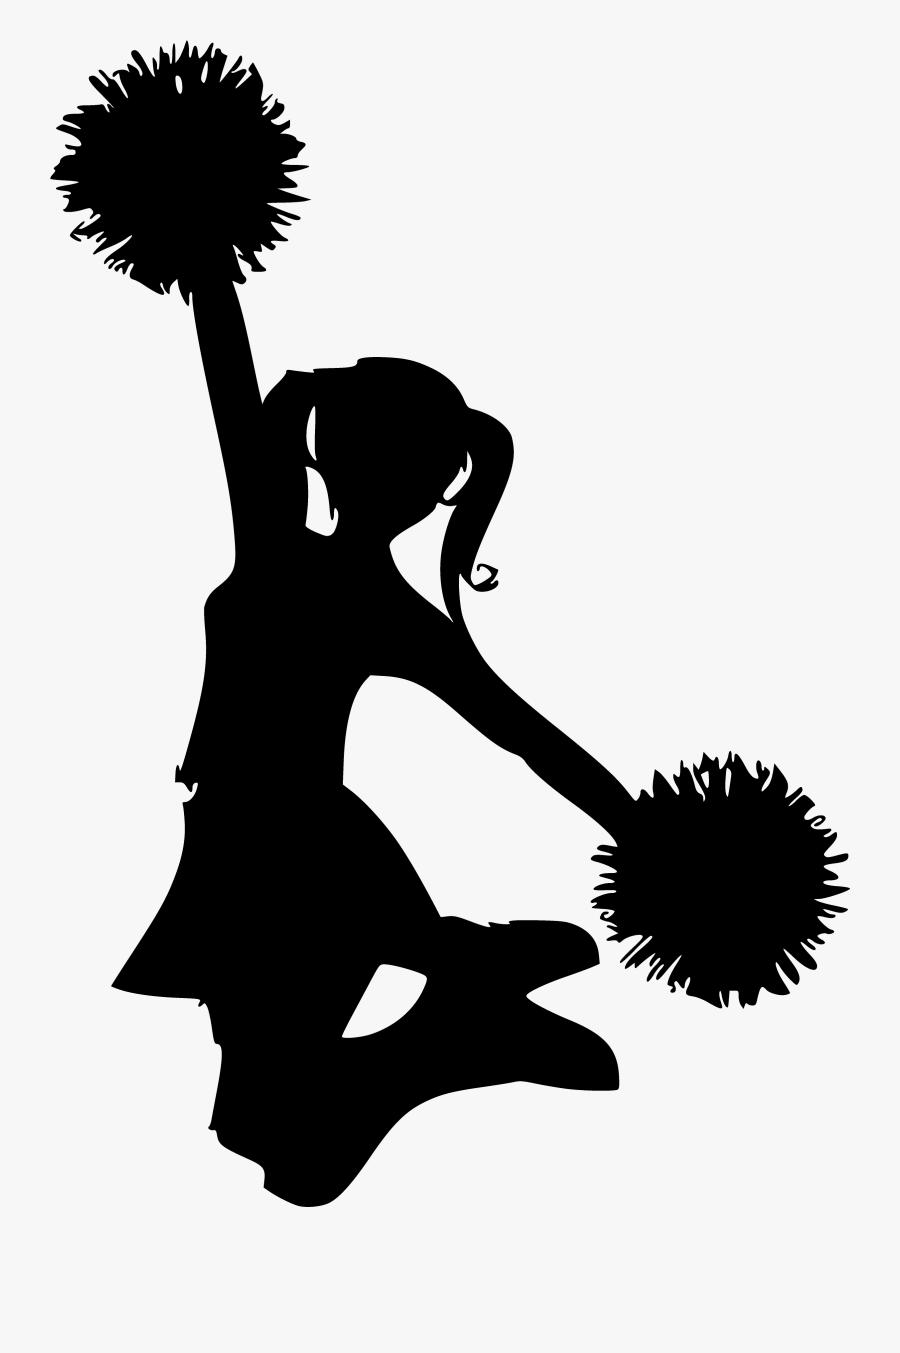 National Football League Cheerleading Royalty.